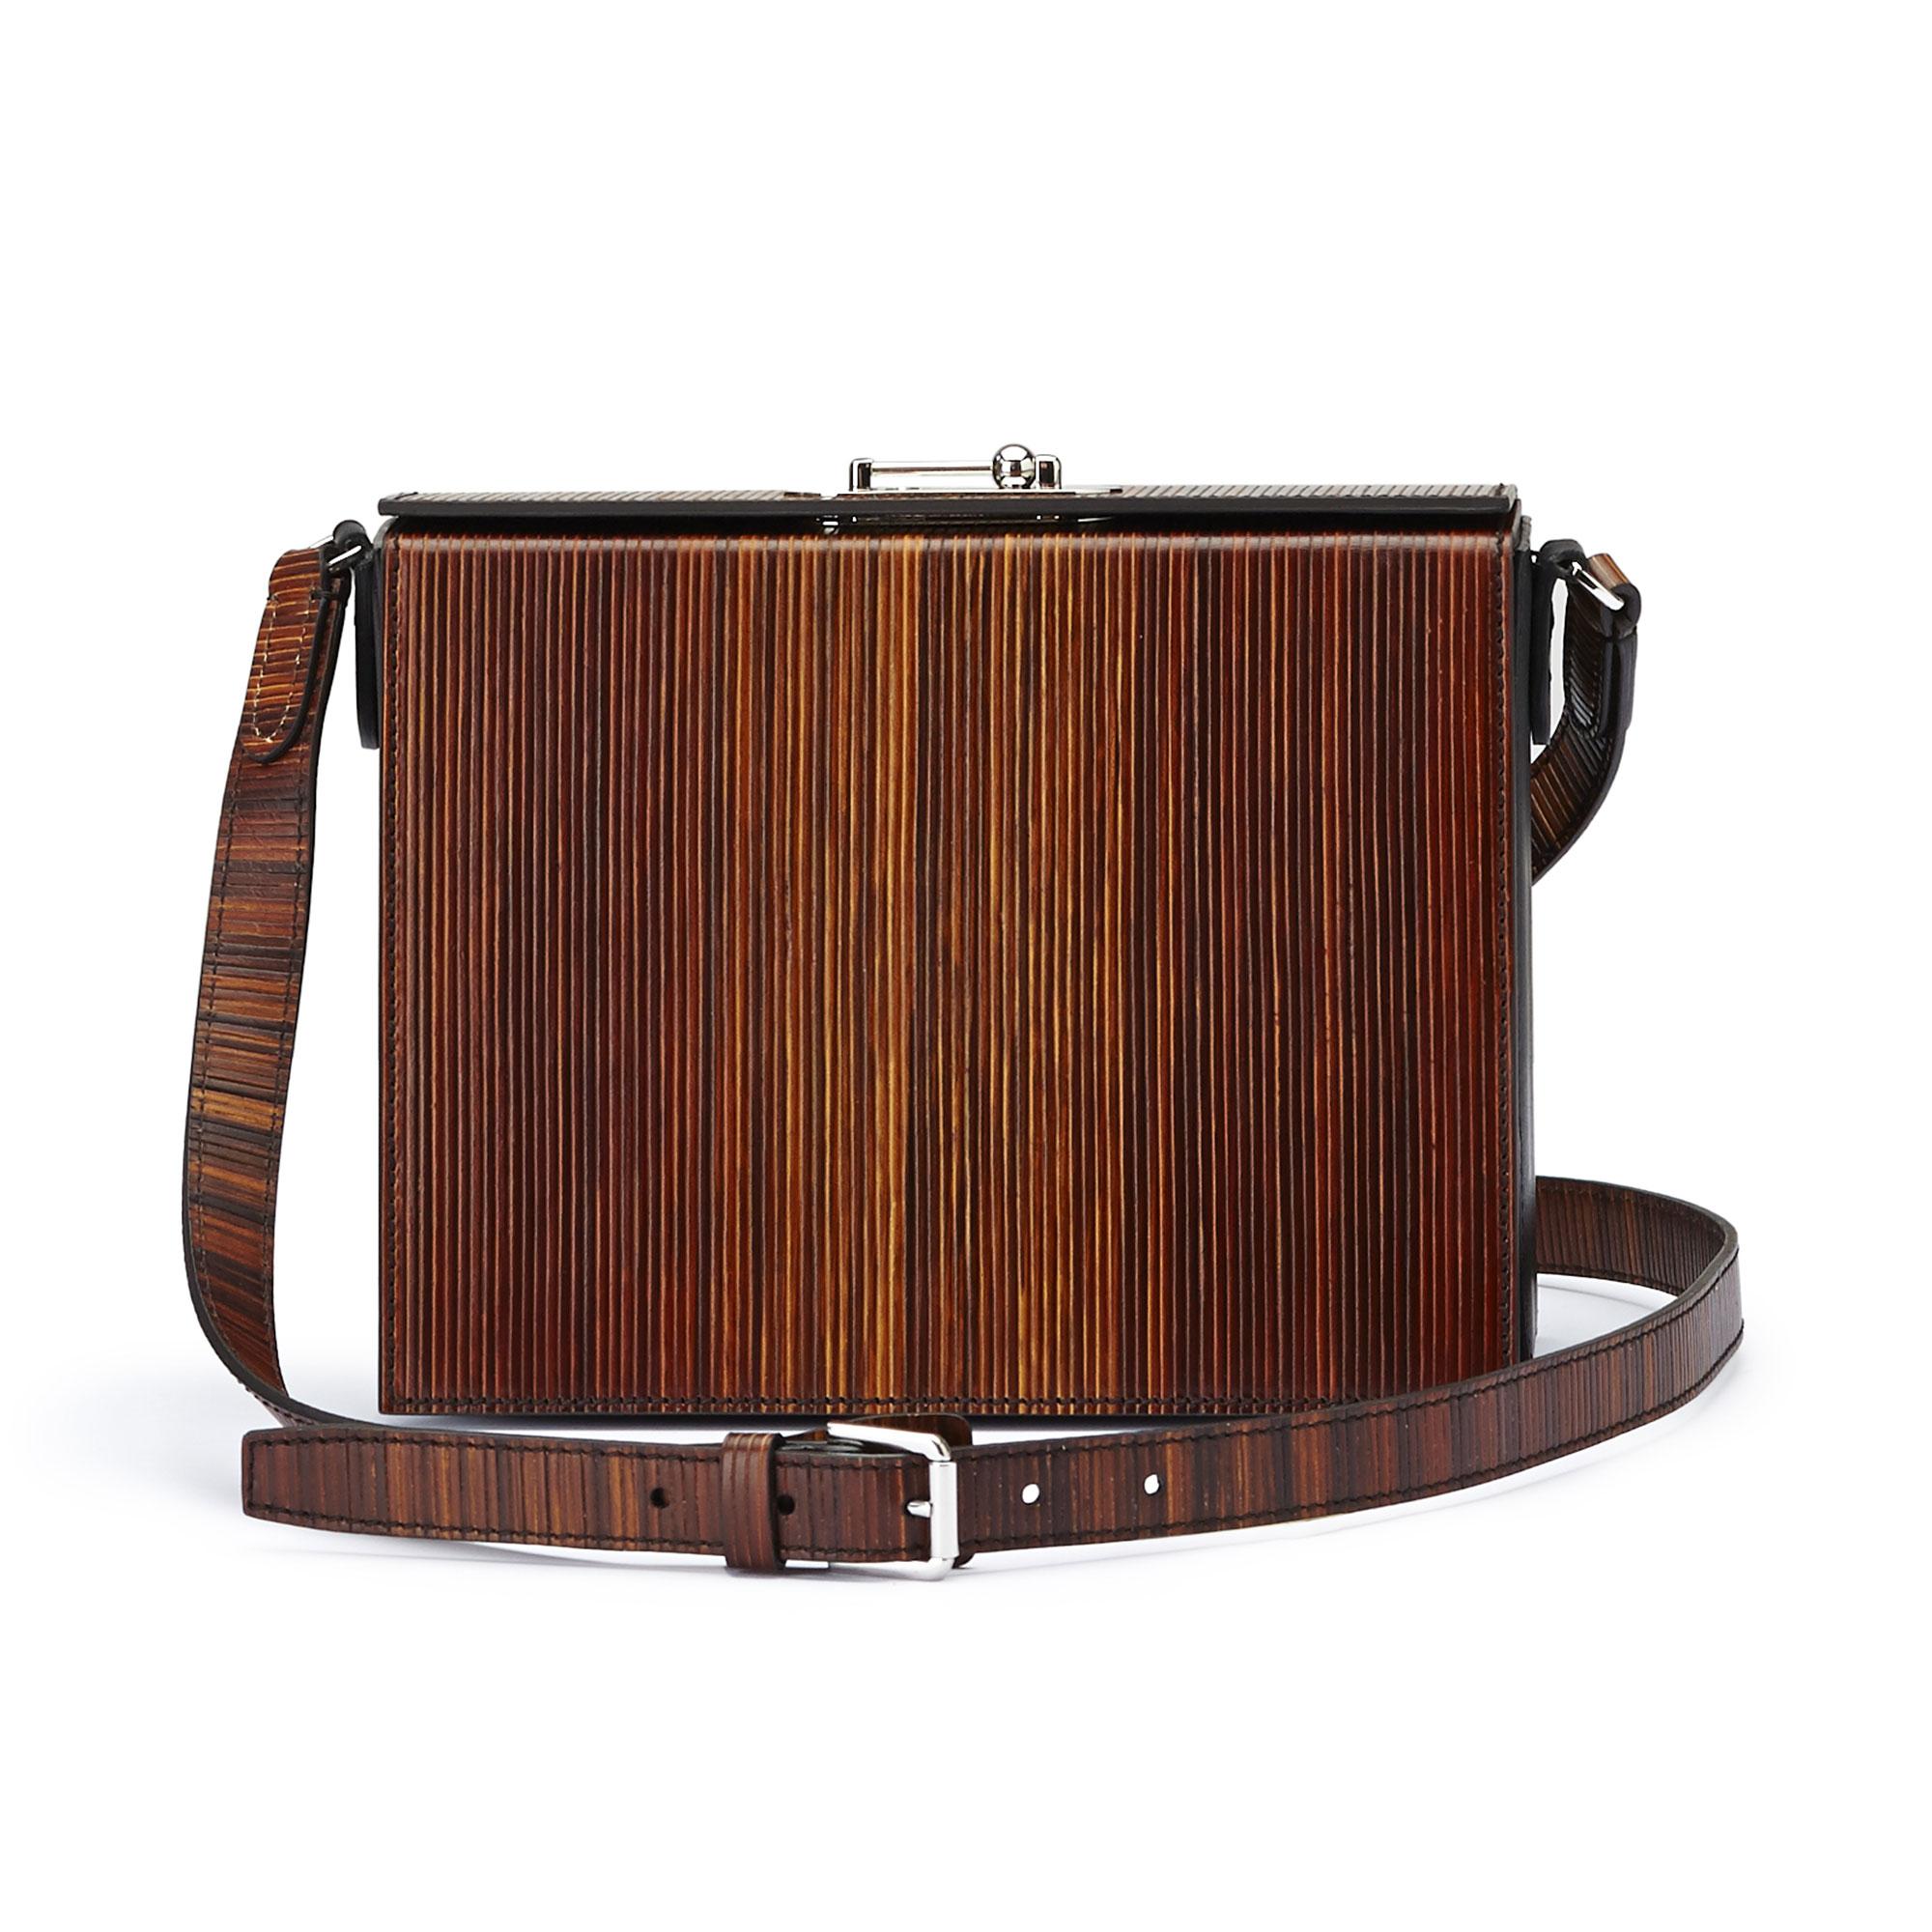 The black effect wood leather french calf Gemma Crossbody bag by Bertoni 1949 01